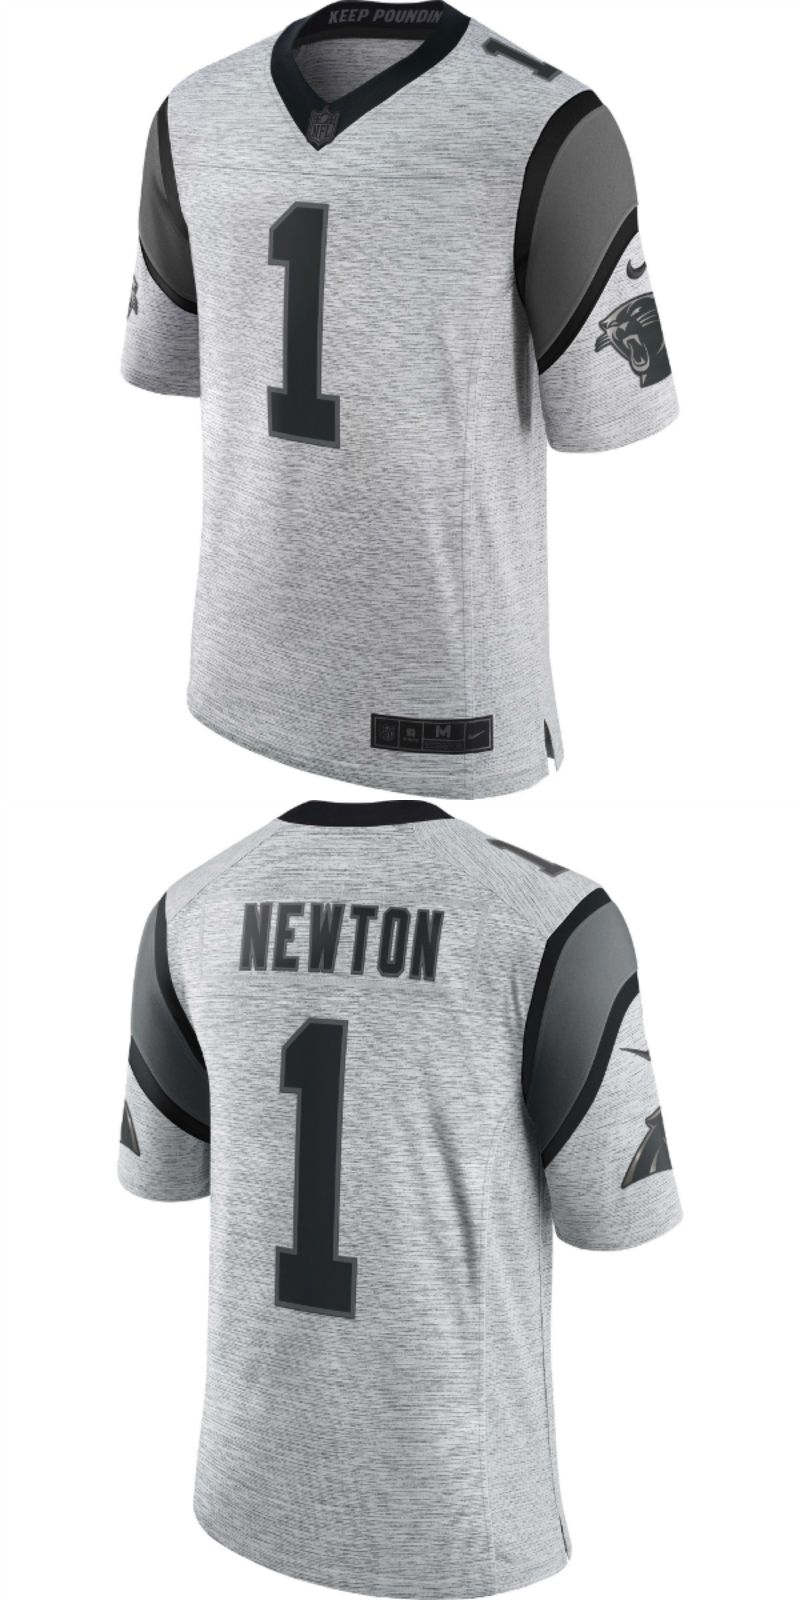 buy popular 43e0f d140a UP TO 70% OFF. Cam Newton Carolina Panthers Nike Gridiron ...